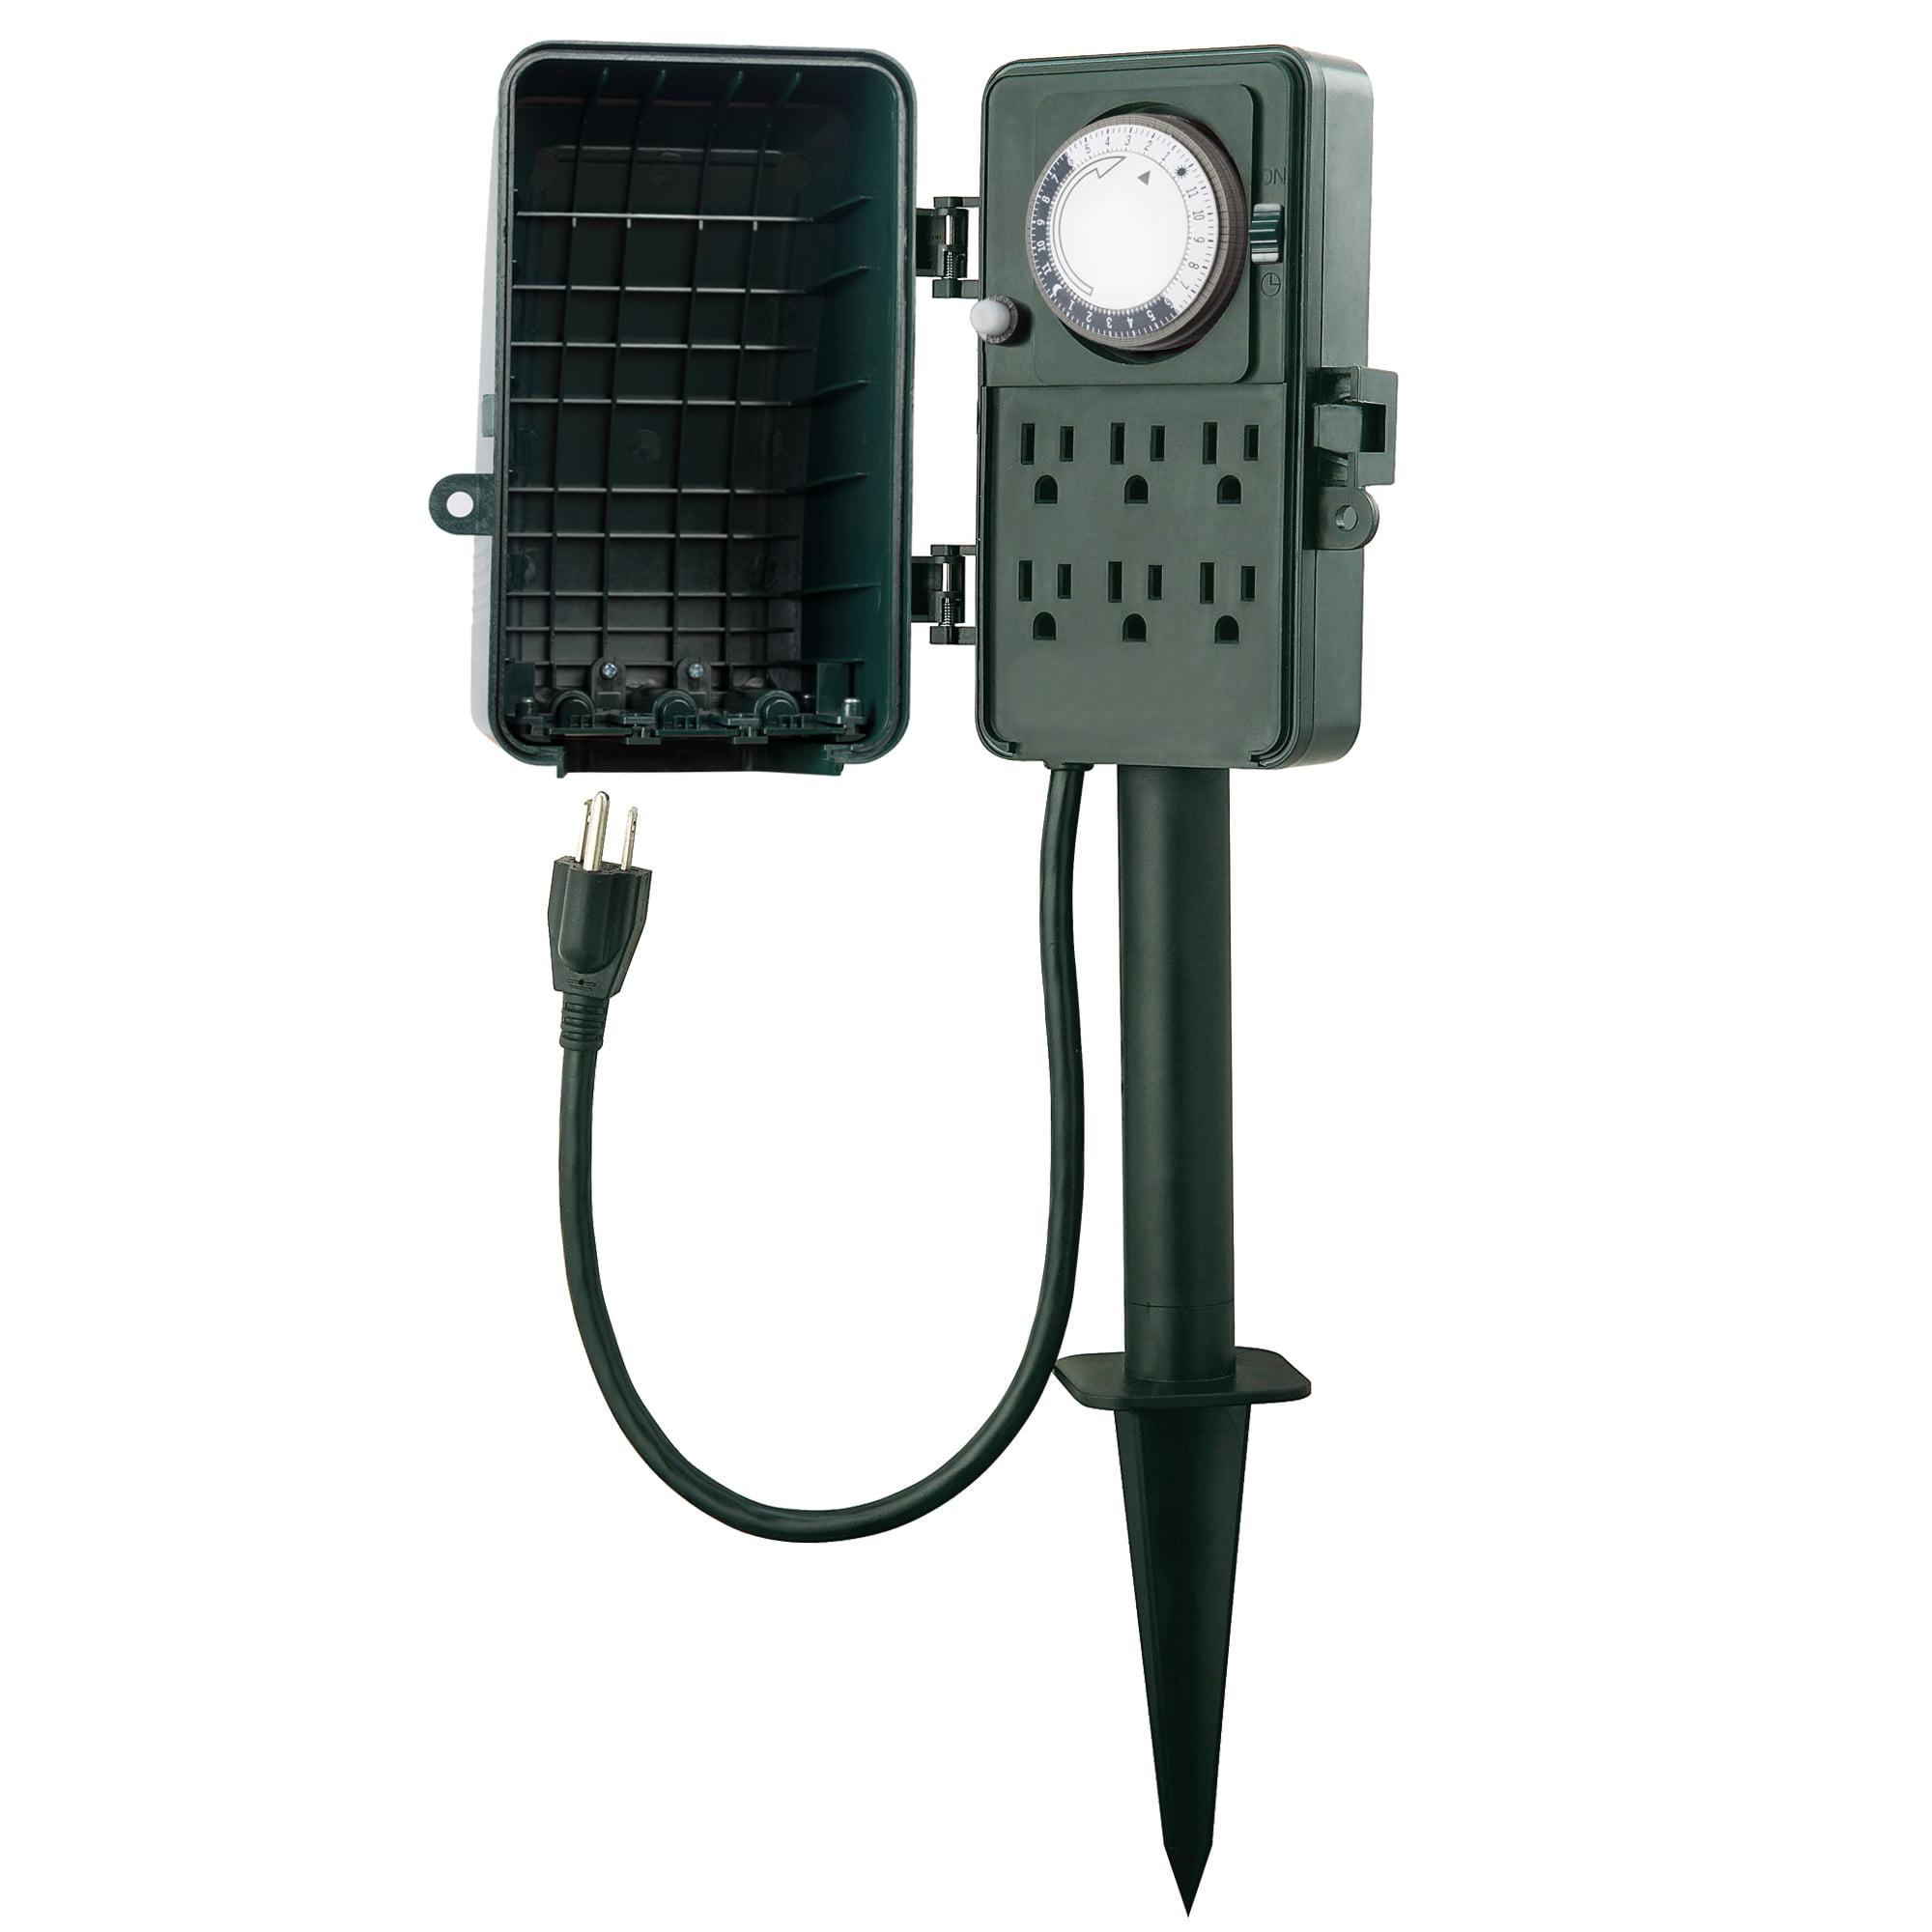 Century 24 Hour Outdoor Mechanical Timer 6 Ways Garden Power Stake Waterproof